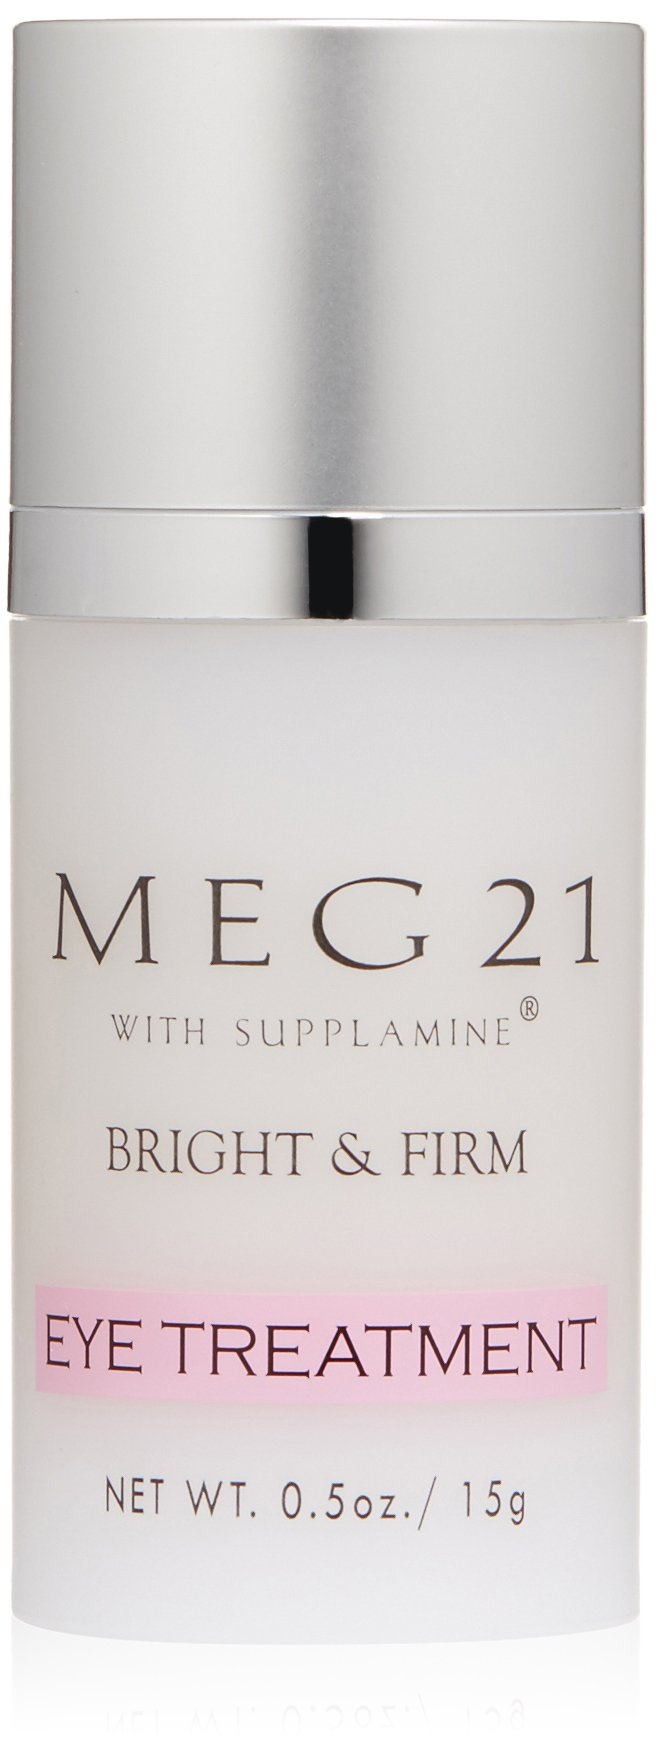 MEG 21 Bright and Firm Eye Treatment, 0.5 Oz